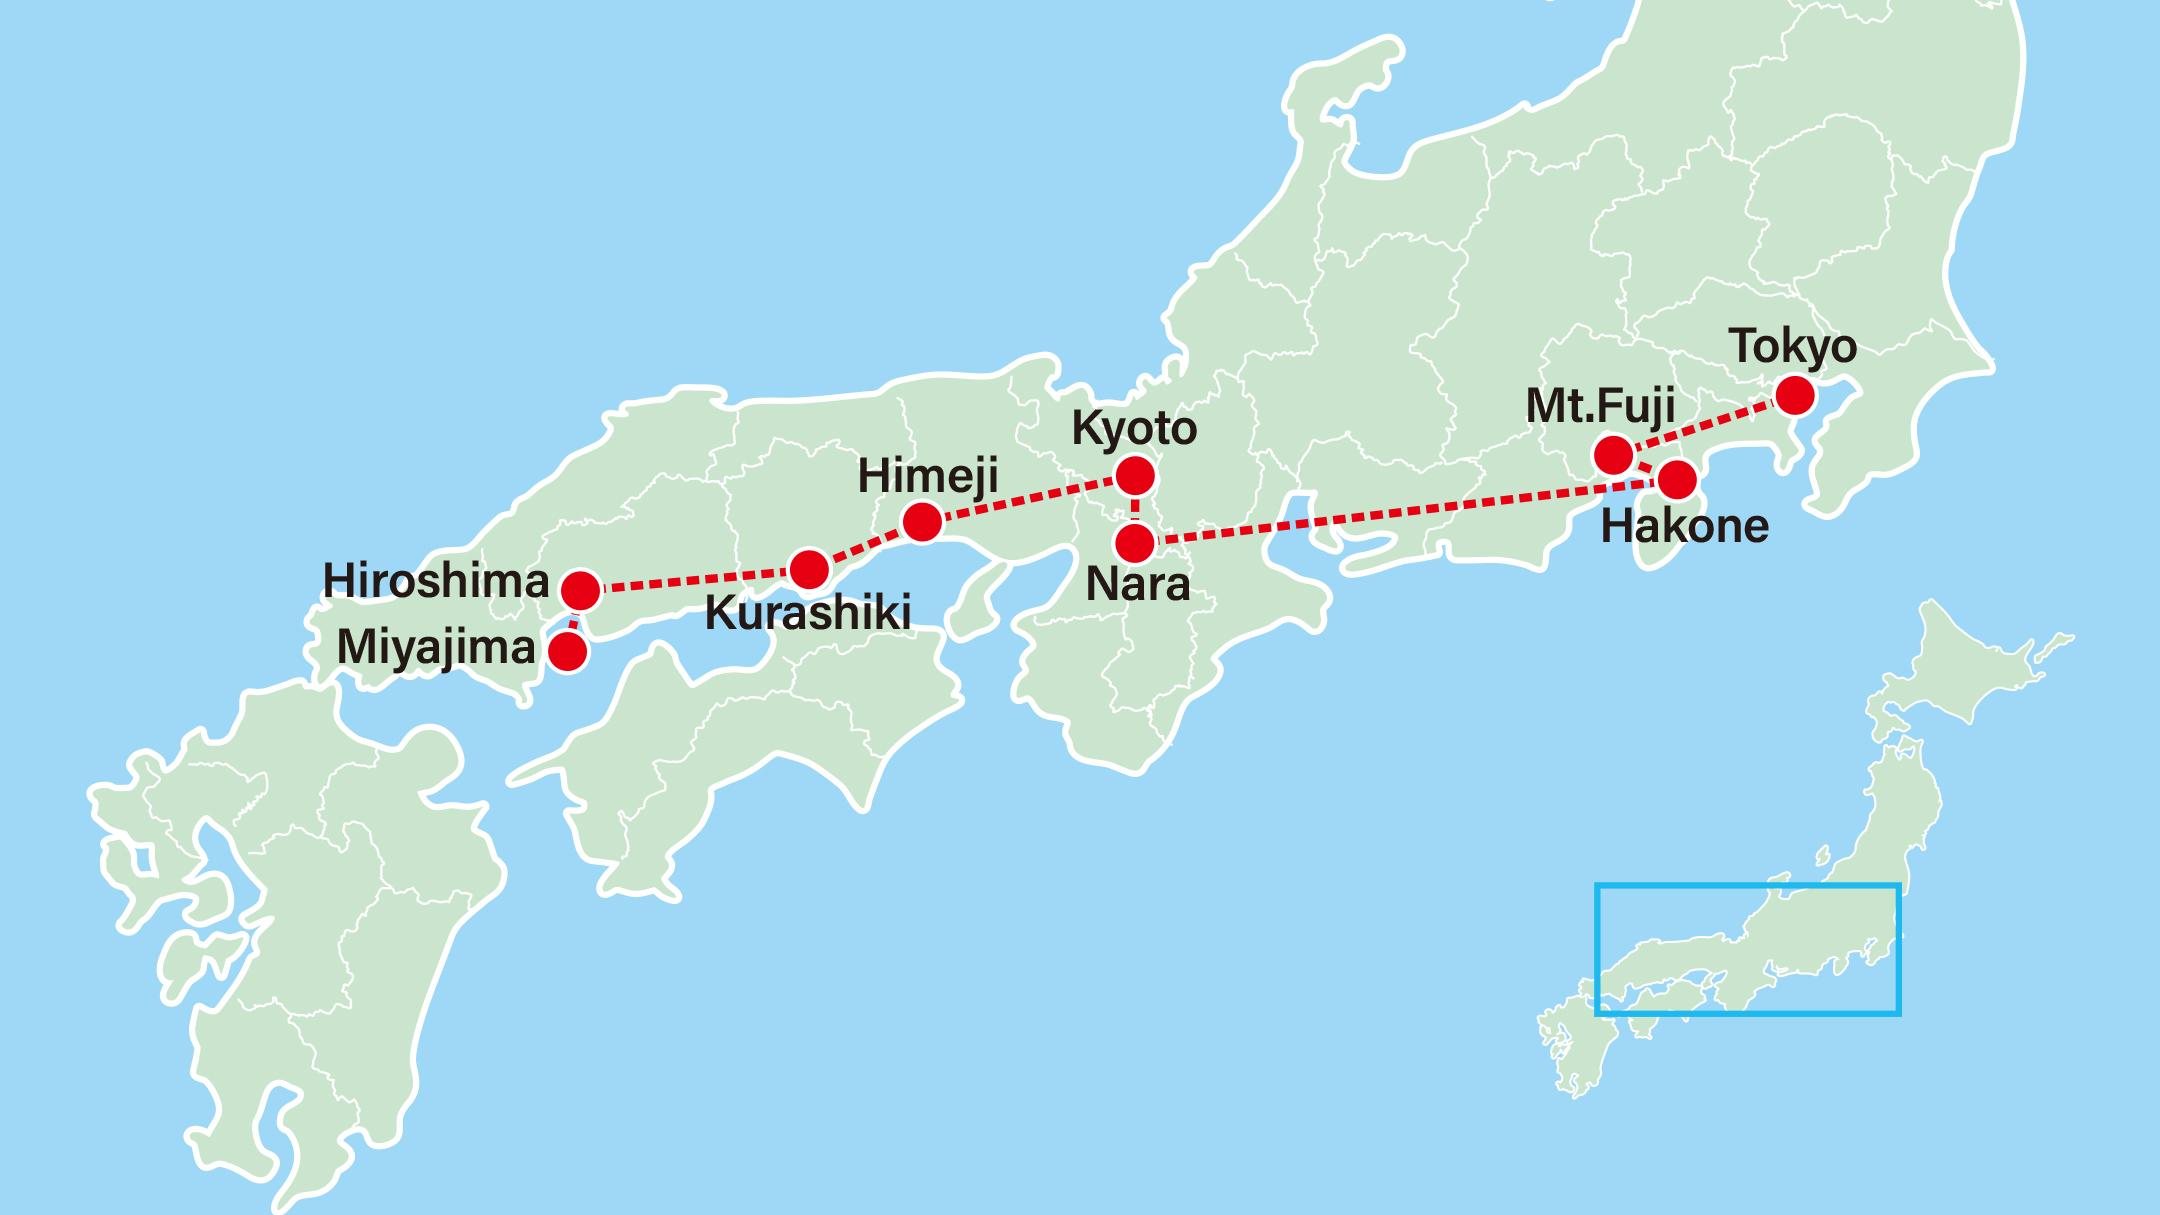 Best of Japan Gion & Anime 11 Day Journey-Gion Festival-Himeji-Kurashiki-Hiroshima-Miyajima-Kyoto-Nara-Hakone-Tokyo-Akihabara